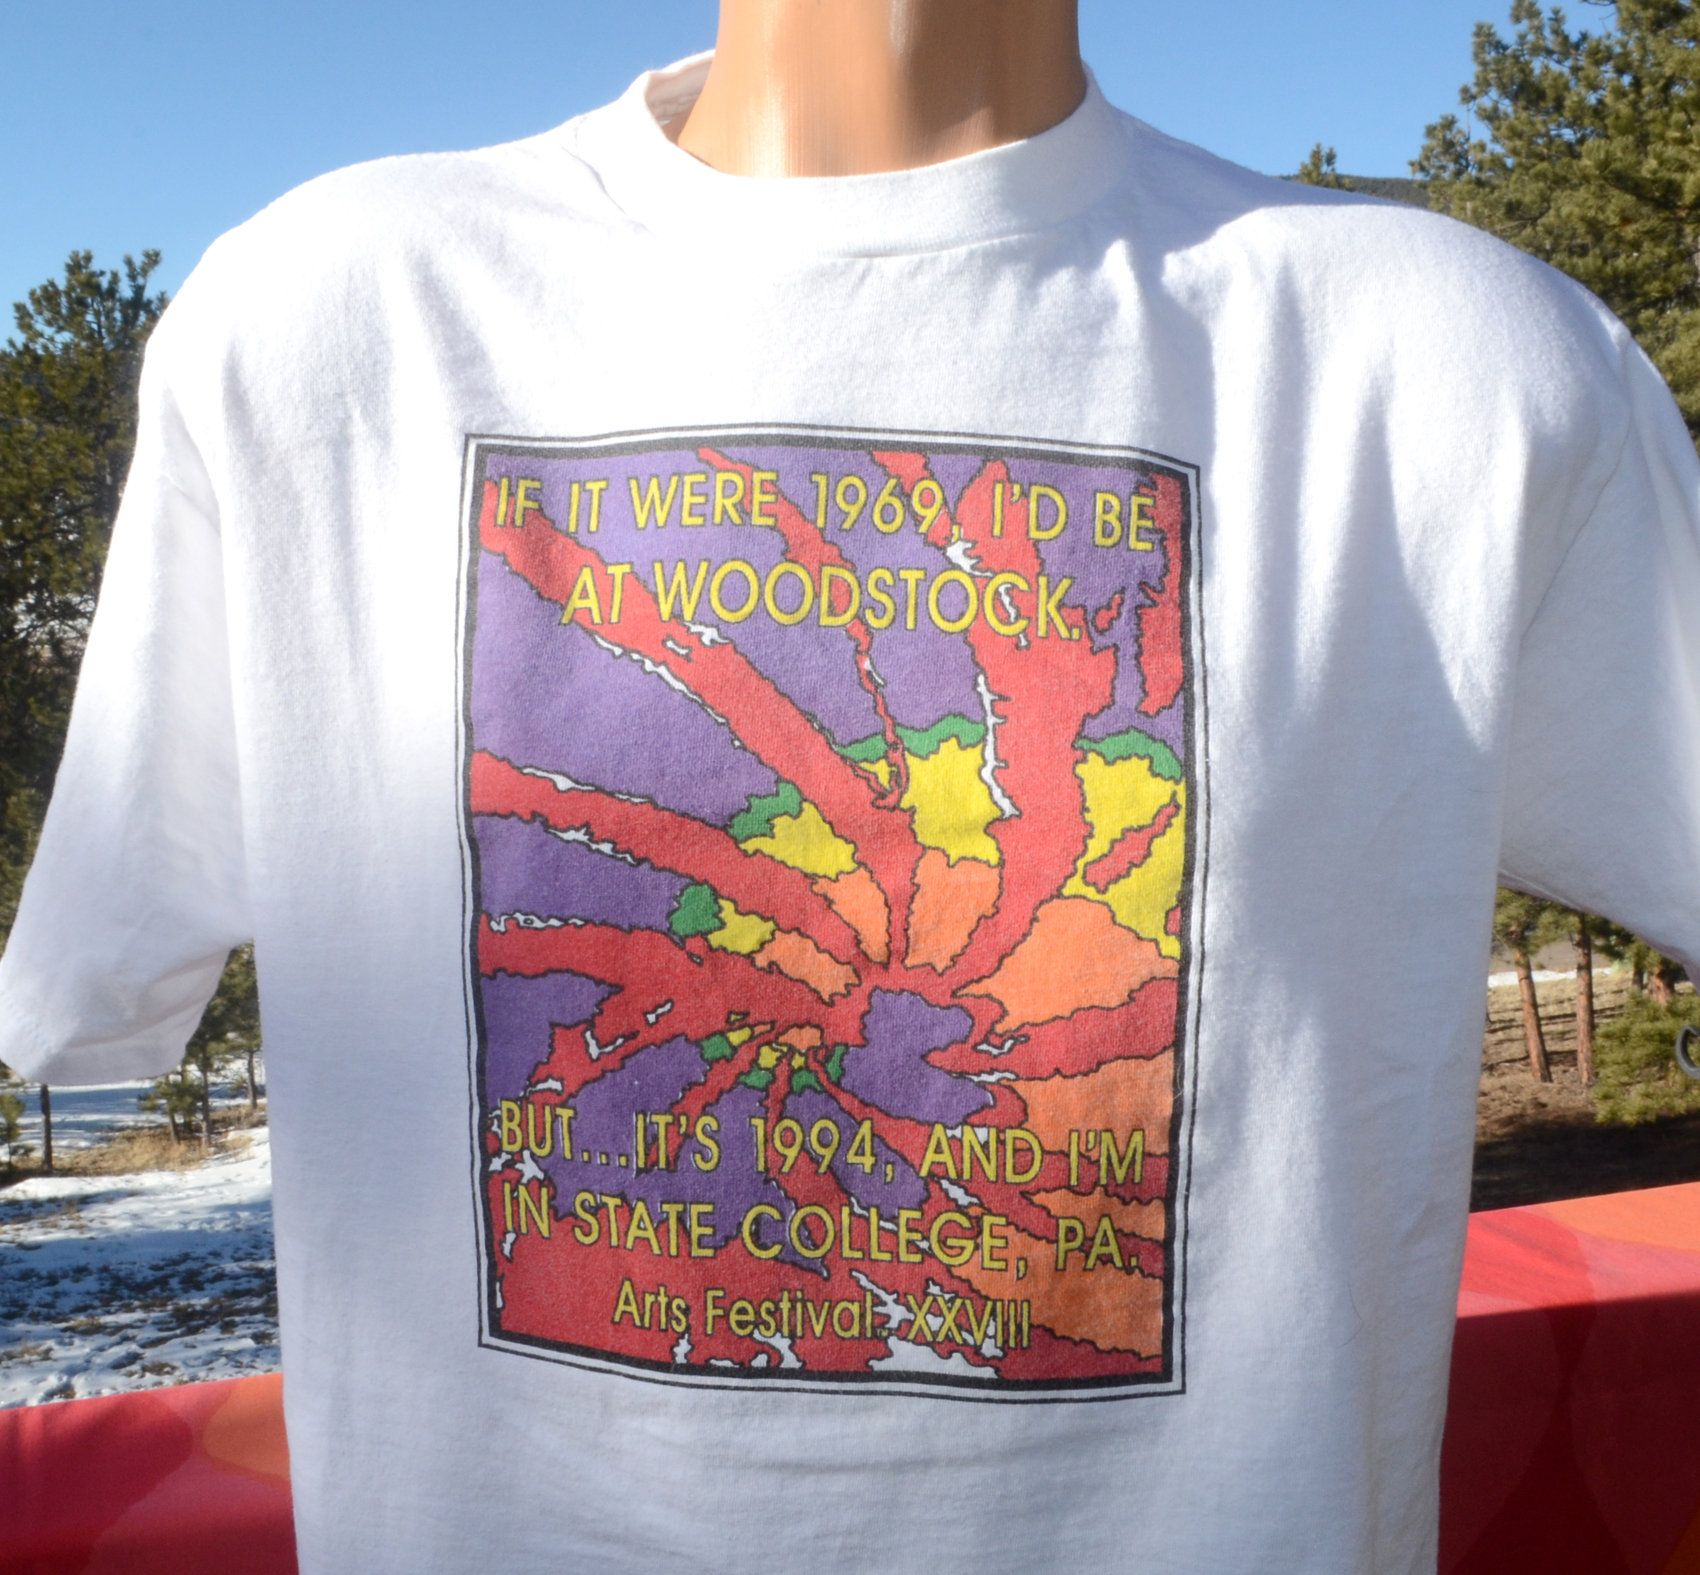 Vintage 90s T Shirt Woodstock Music Art State College Festival Etsy Woodstock Music Music Art Woodstock [ 1575 x 1700 Pixel ]